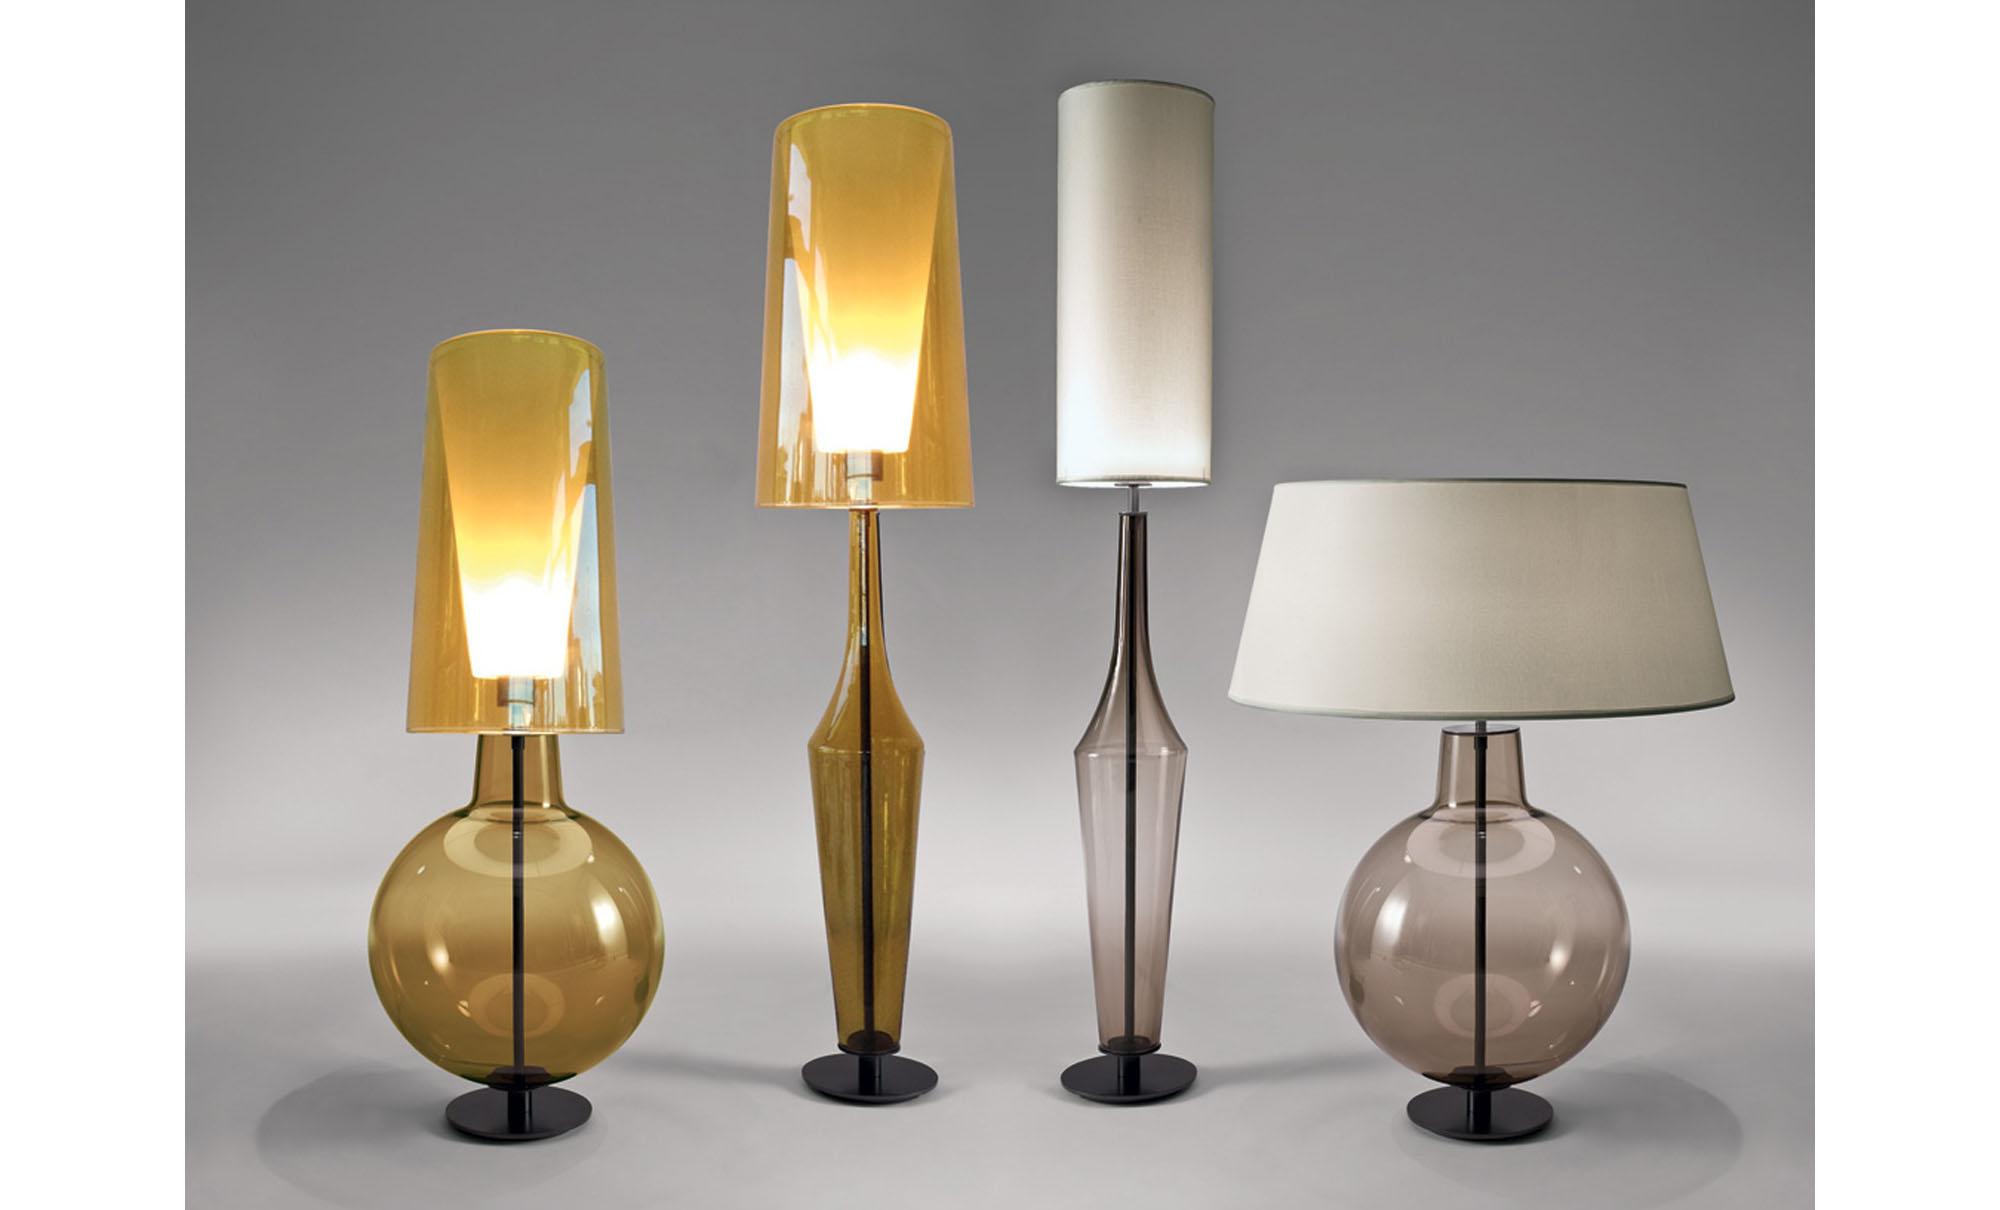 Tic Toc Lamp Fanuli Furniture # Muebles Tic Toc